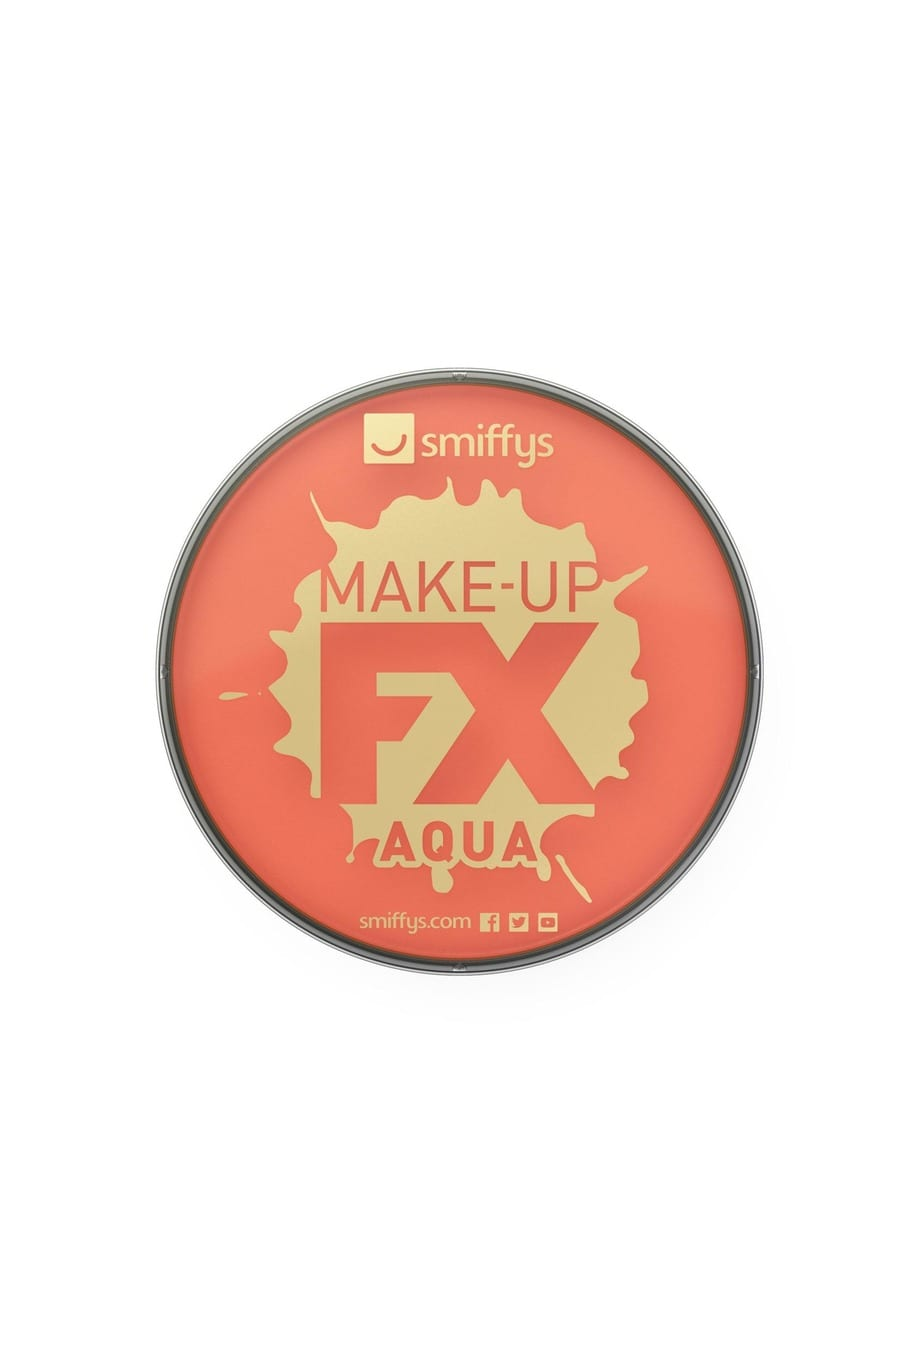 Smiffys Make-Up FX Orange 16ml-0